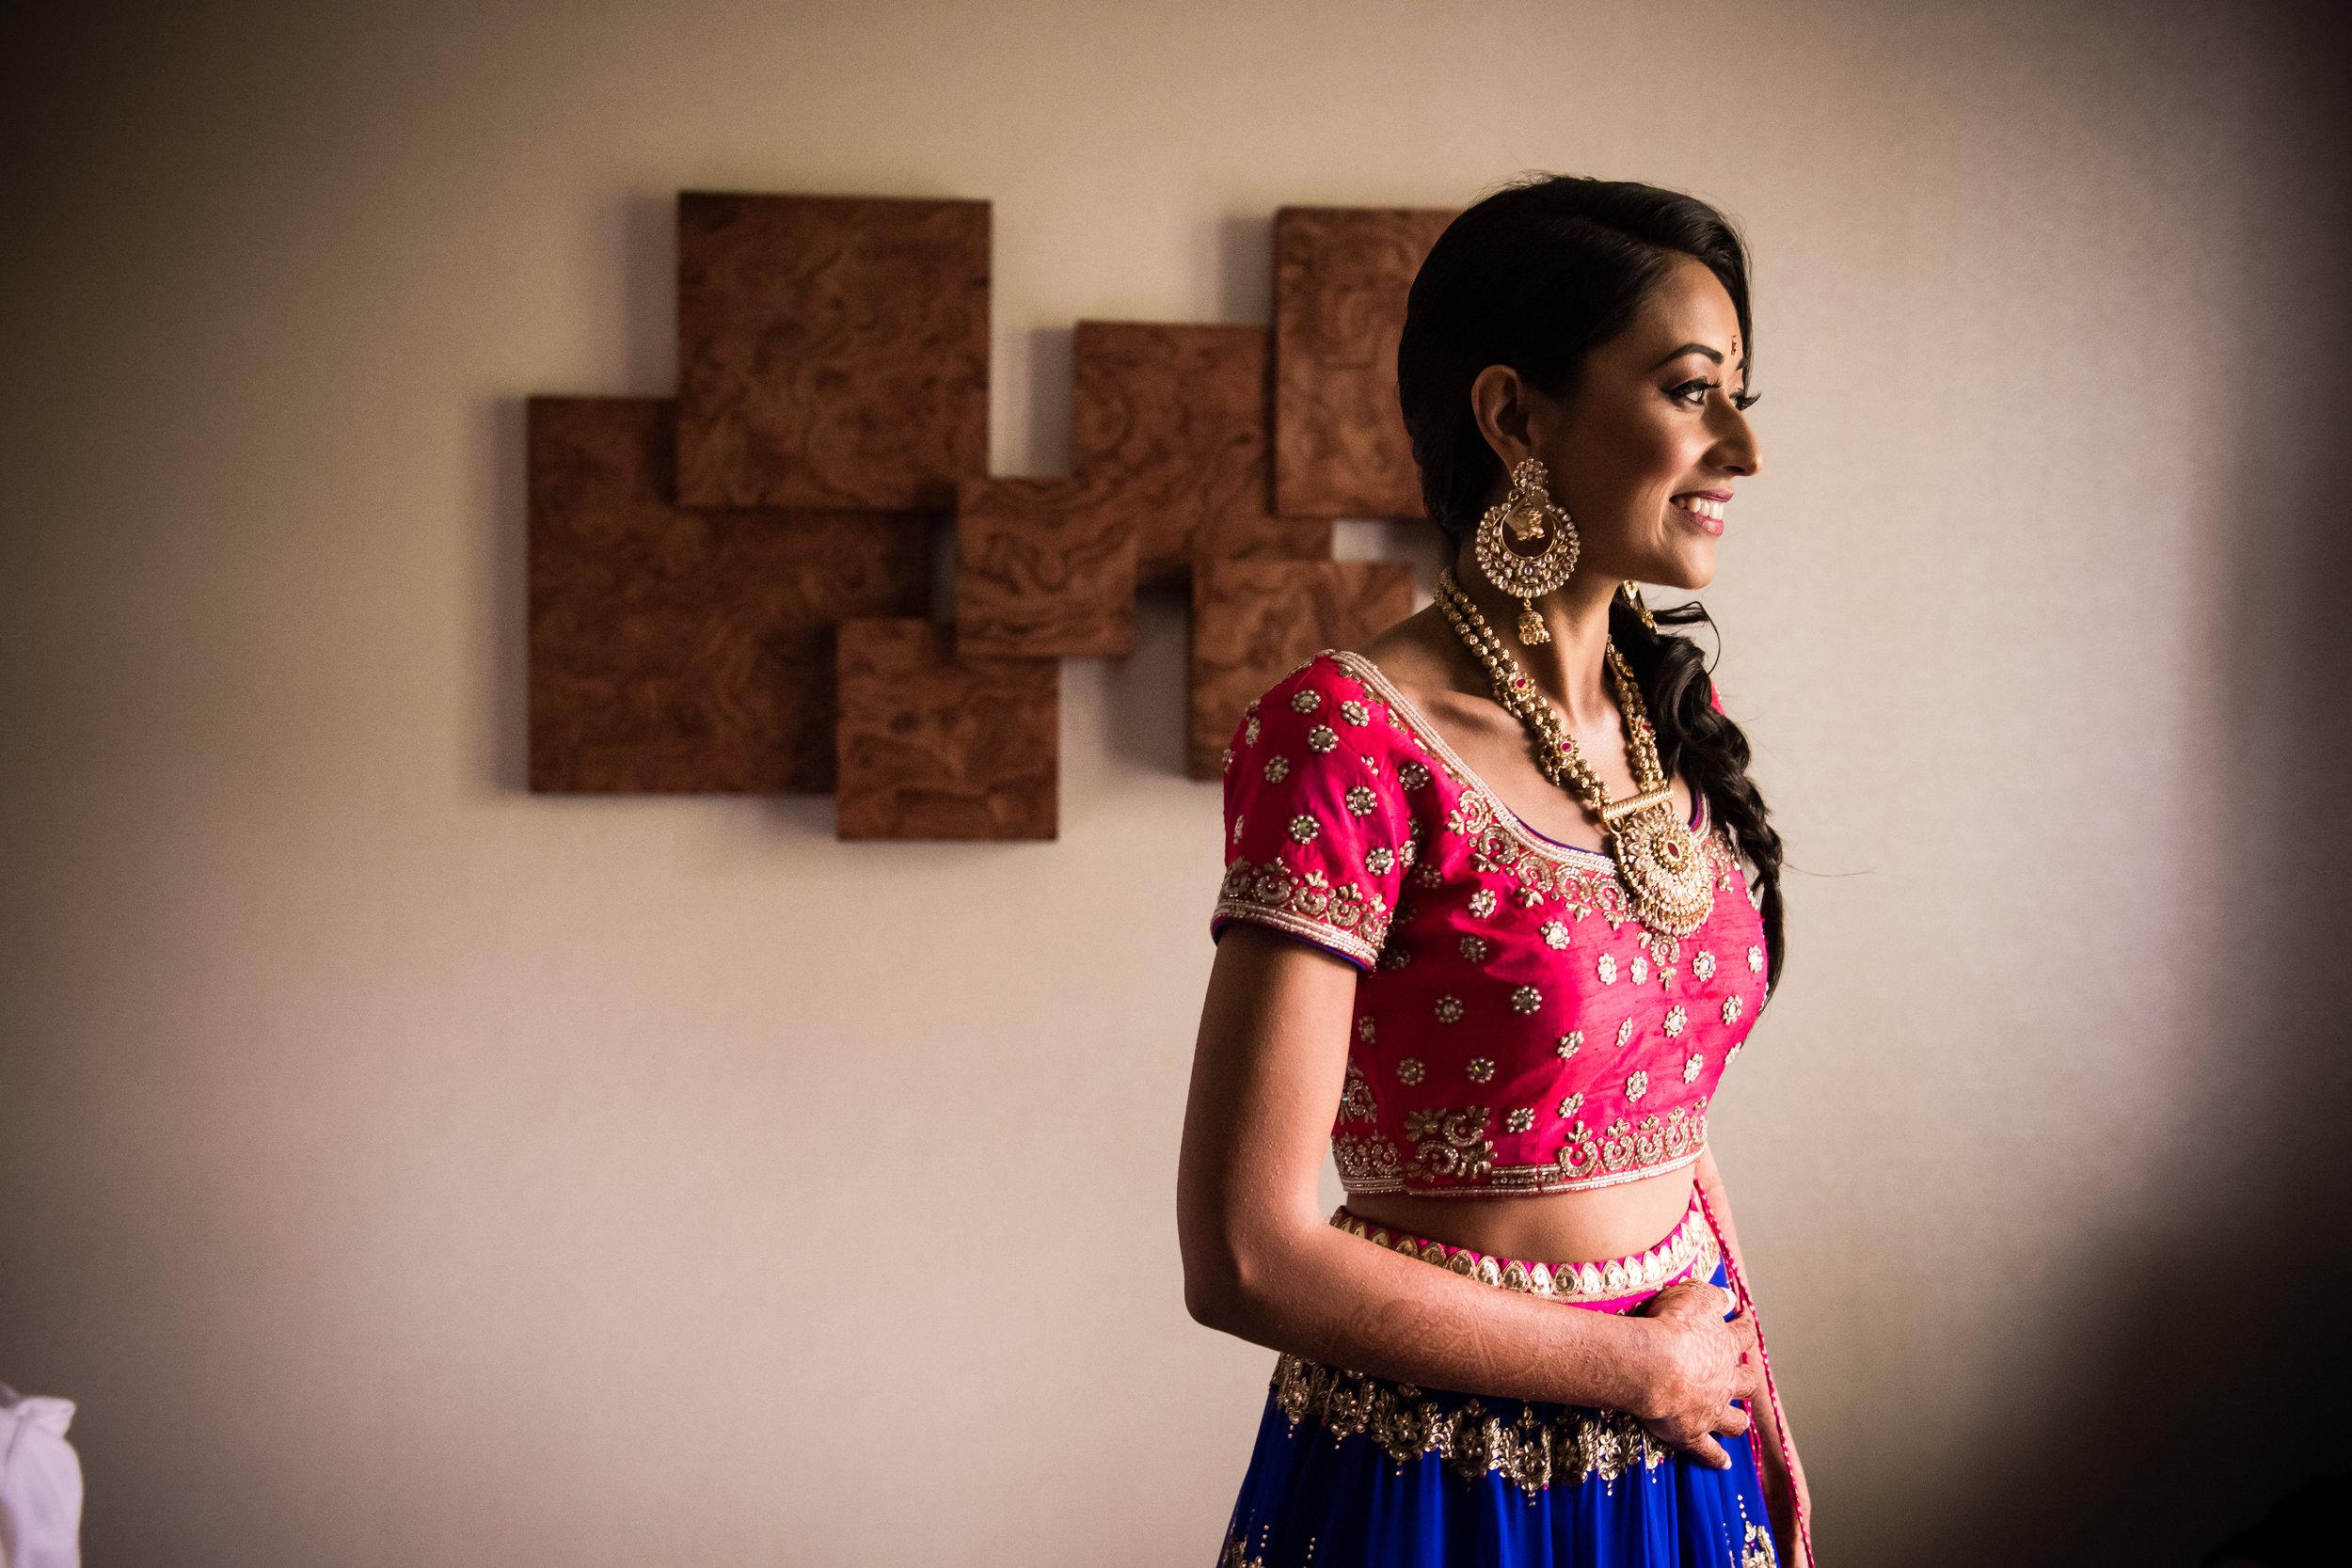 INDIAN WEDDING SANGEET BRIDE SHOT.jpg